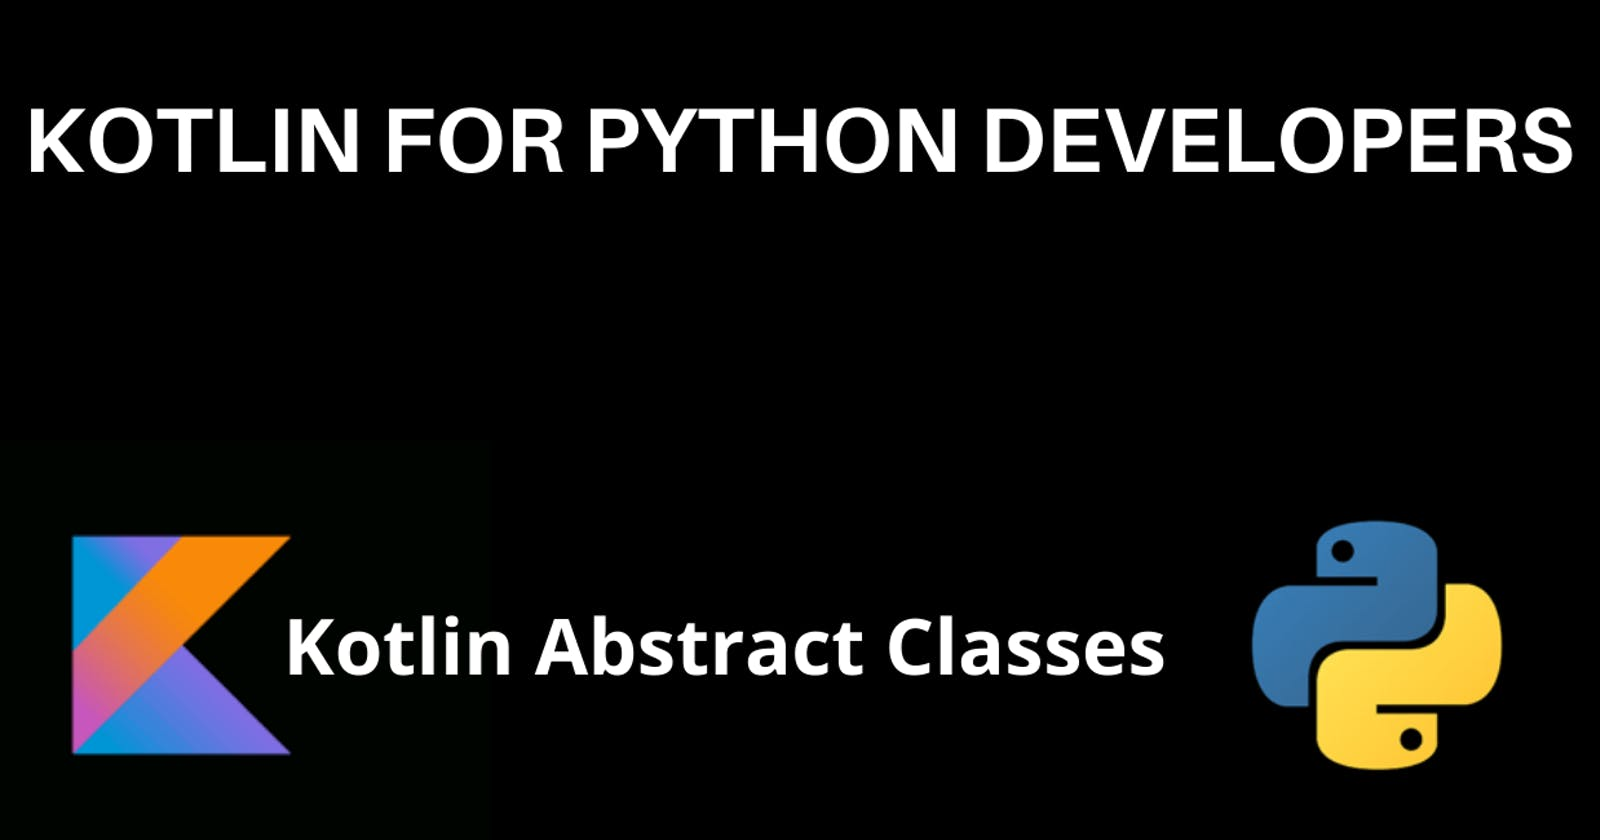 Kotlin Abstract Classes